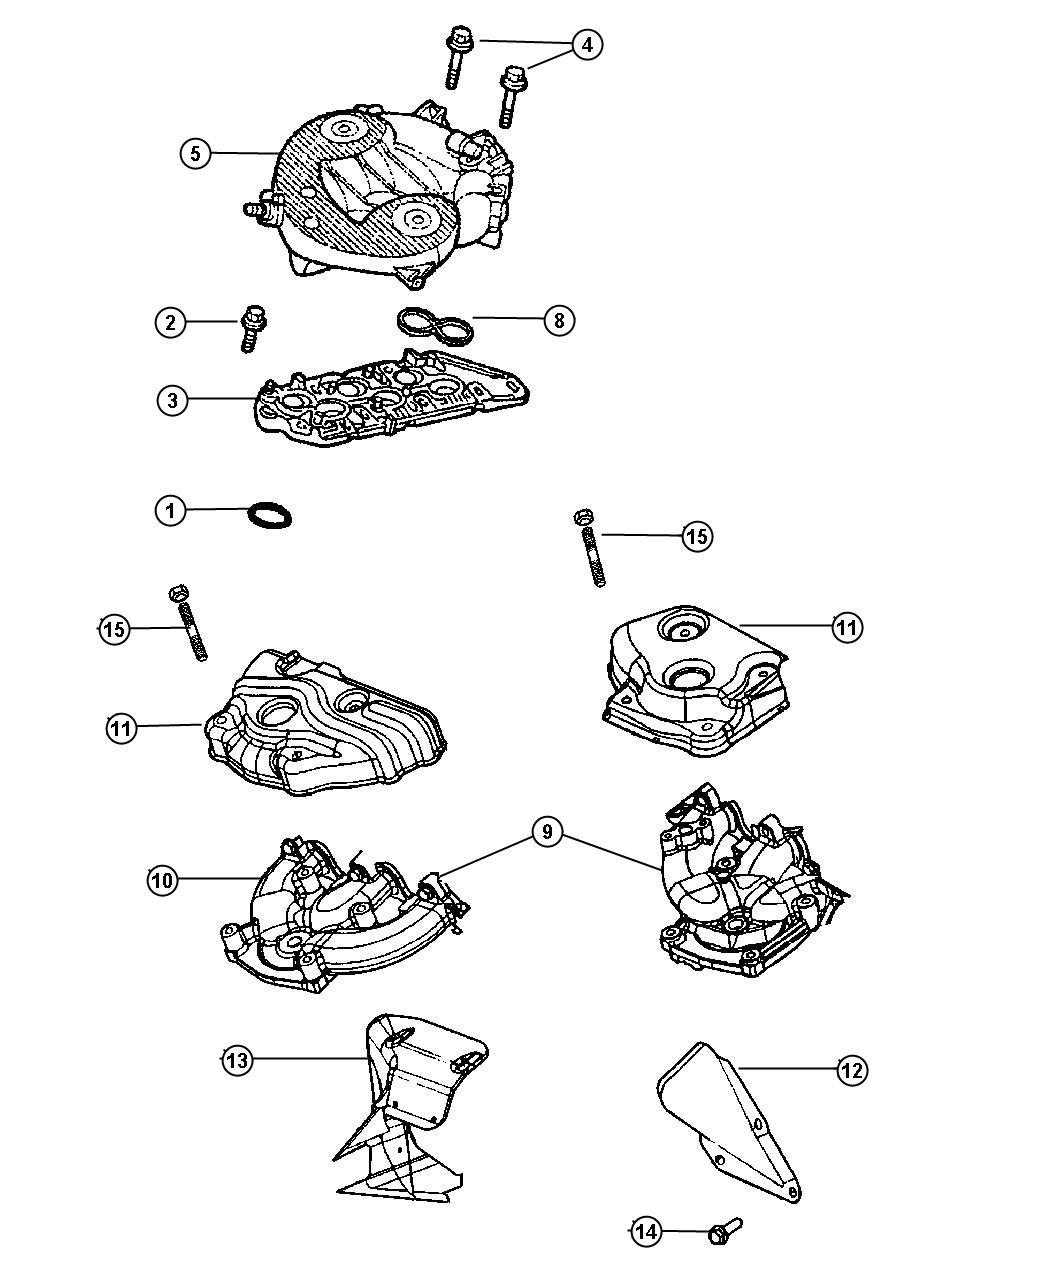 2002 Dodge Stratus Plenum. Intake manifold. [nzc], use 8